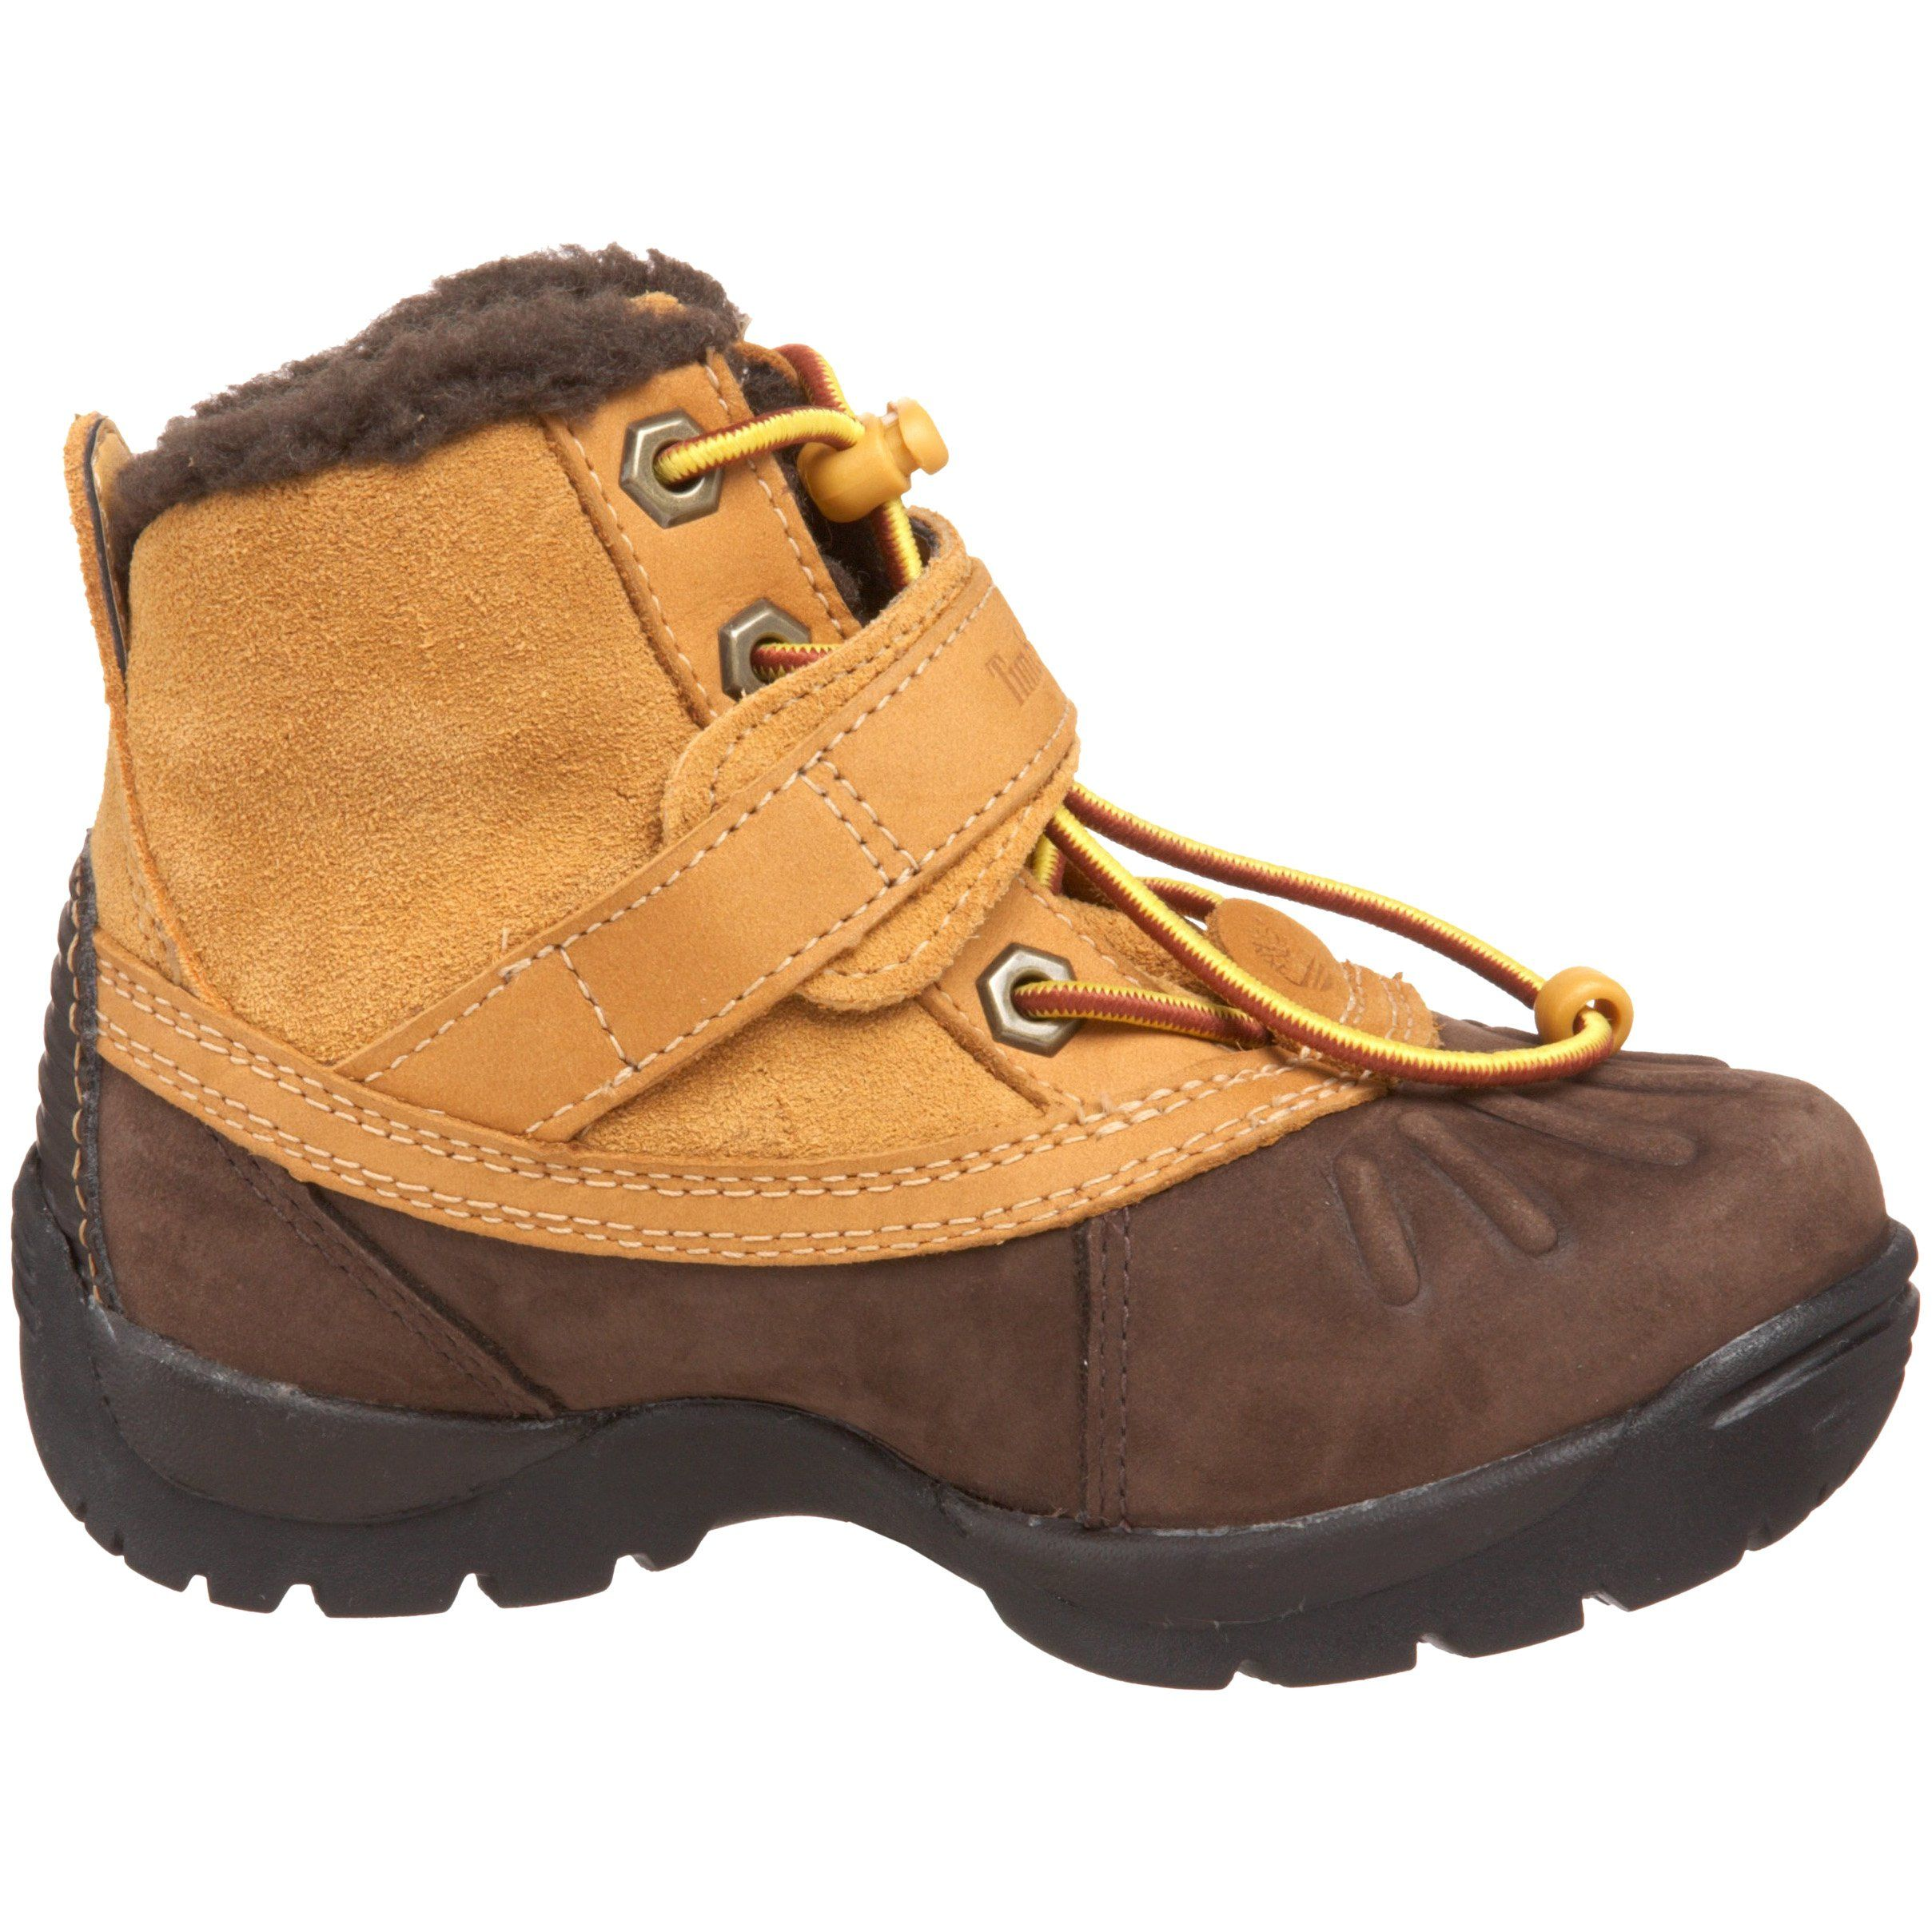 Timberland Kids Mallard Waterproof High-Top Buckle Boot Toddler//Little Kid//Big Kid